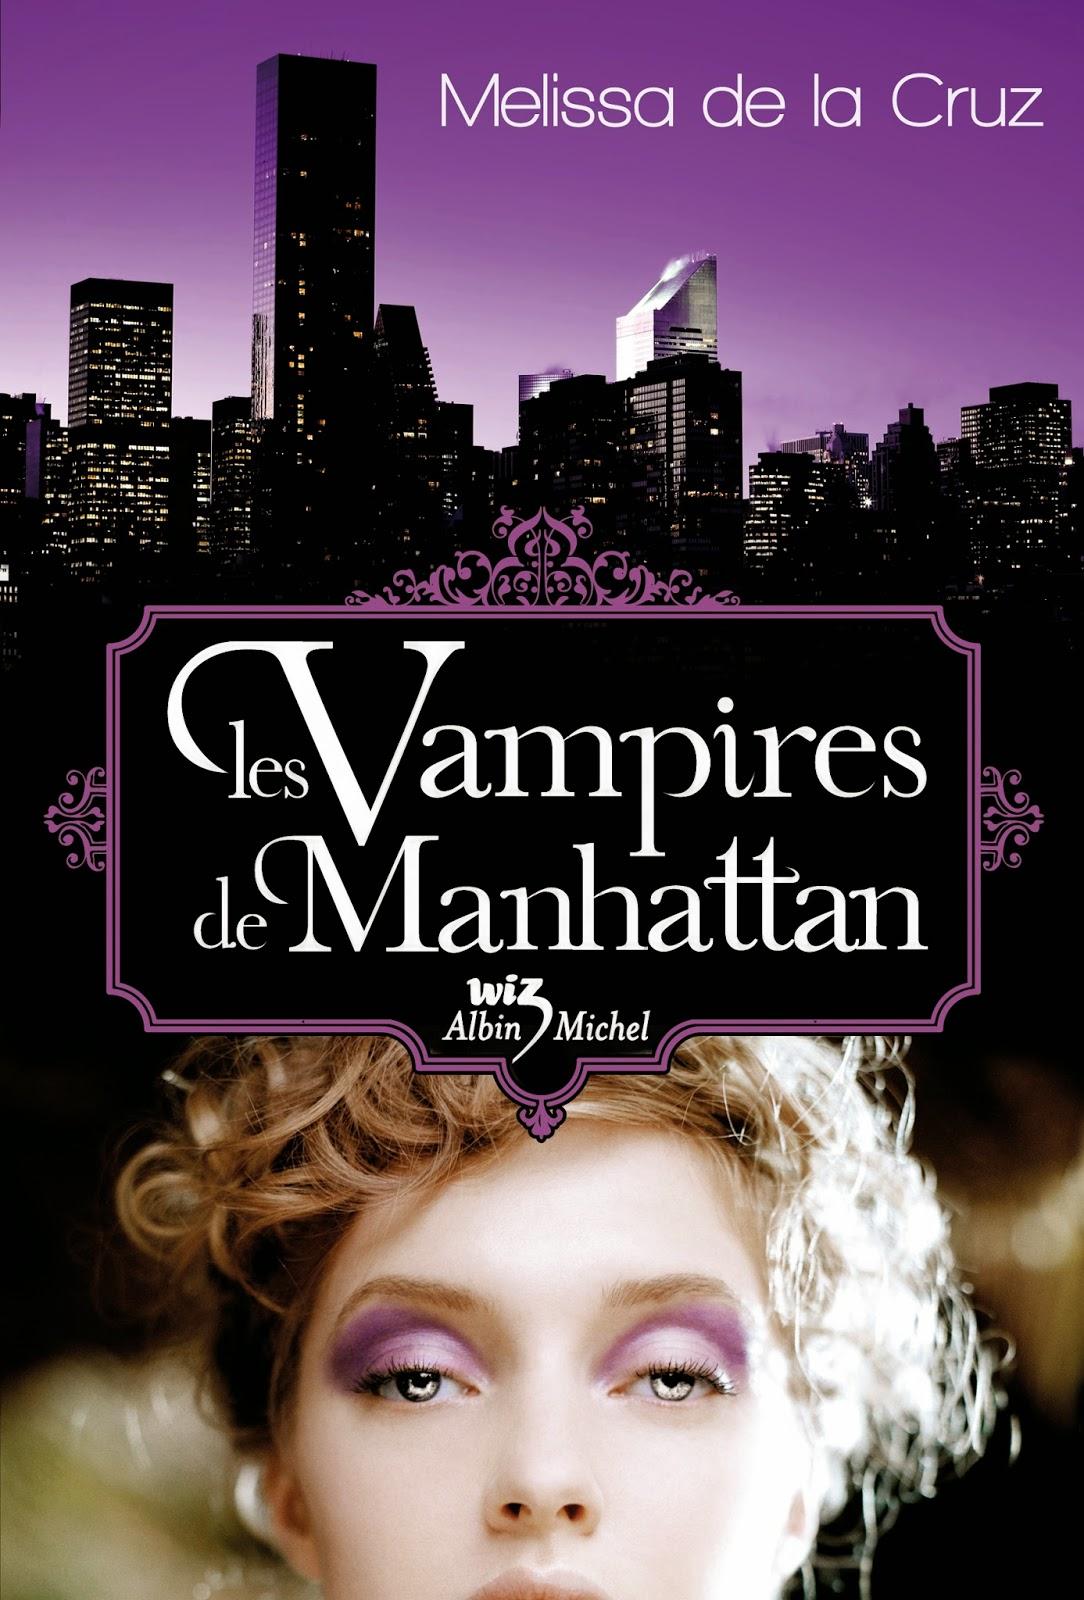 http://lescapadelivresque.blogspot.fr/2014/06/les-vampires-de-manhattan-melissa-de-la.html